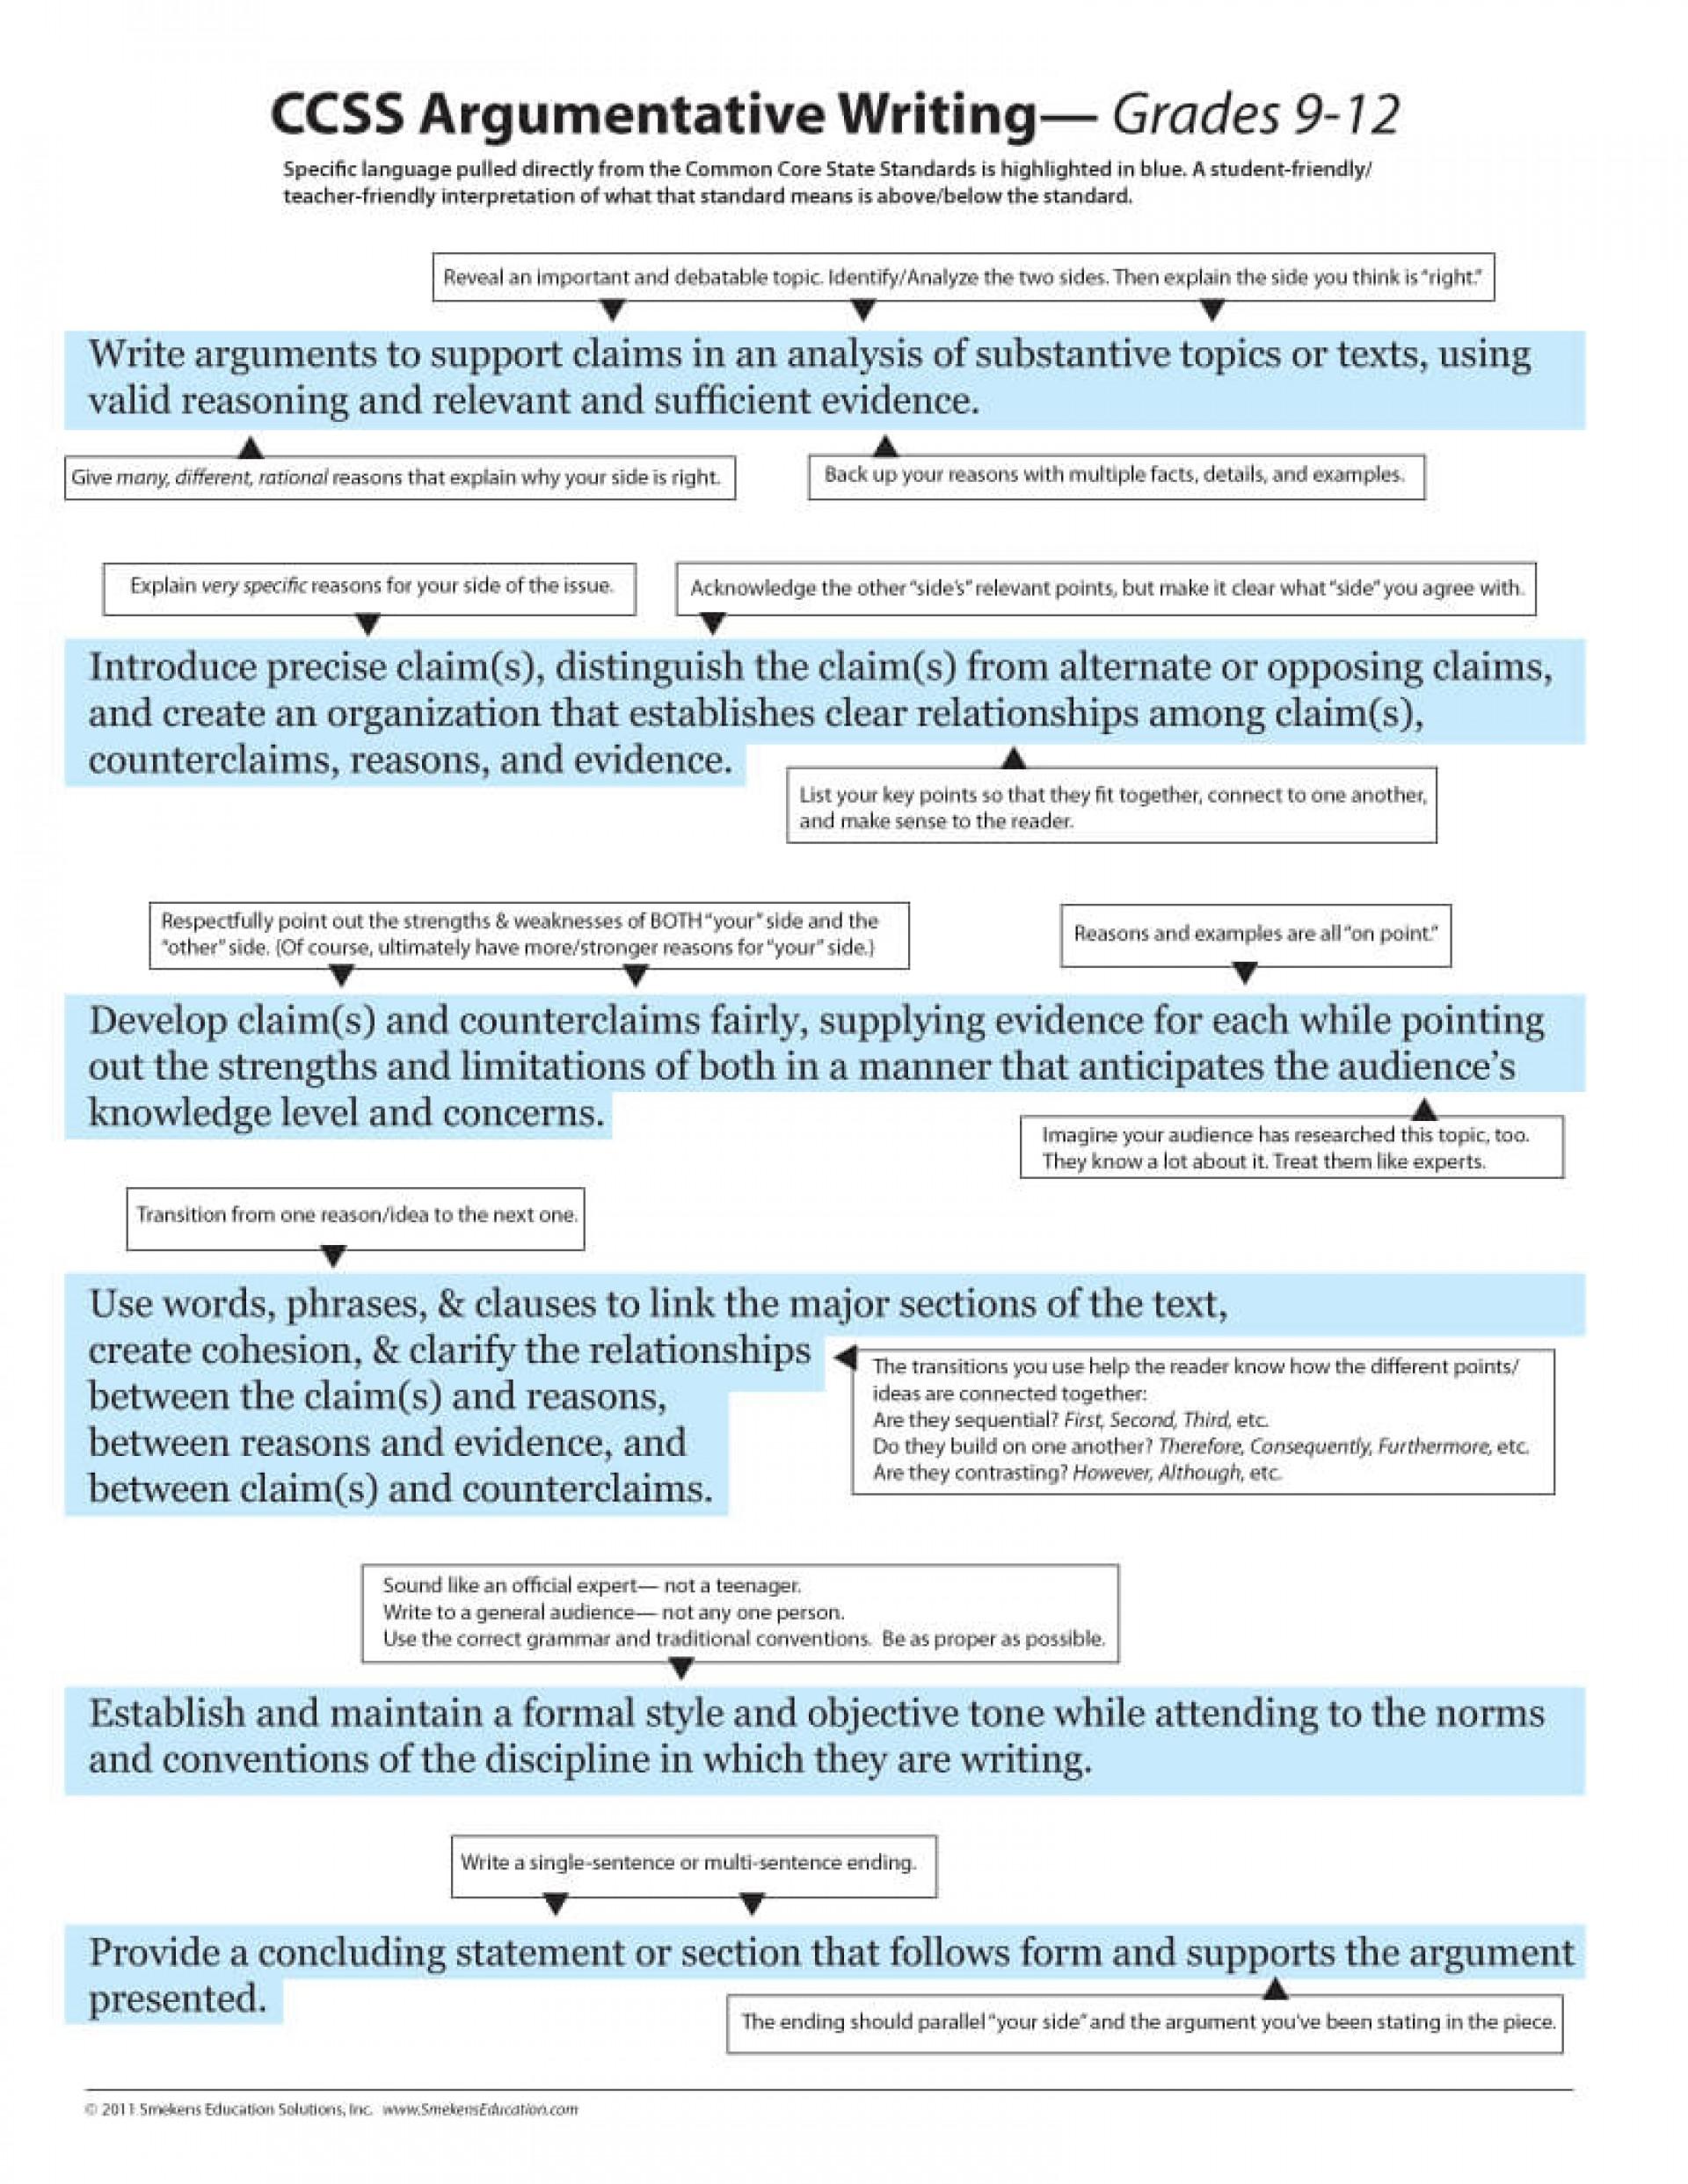 016 Essay Example Argumentative Persuasive Ccss Grade 9 Impressive Ppt On Abortion 1920